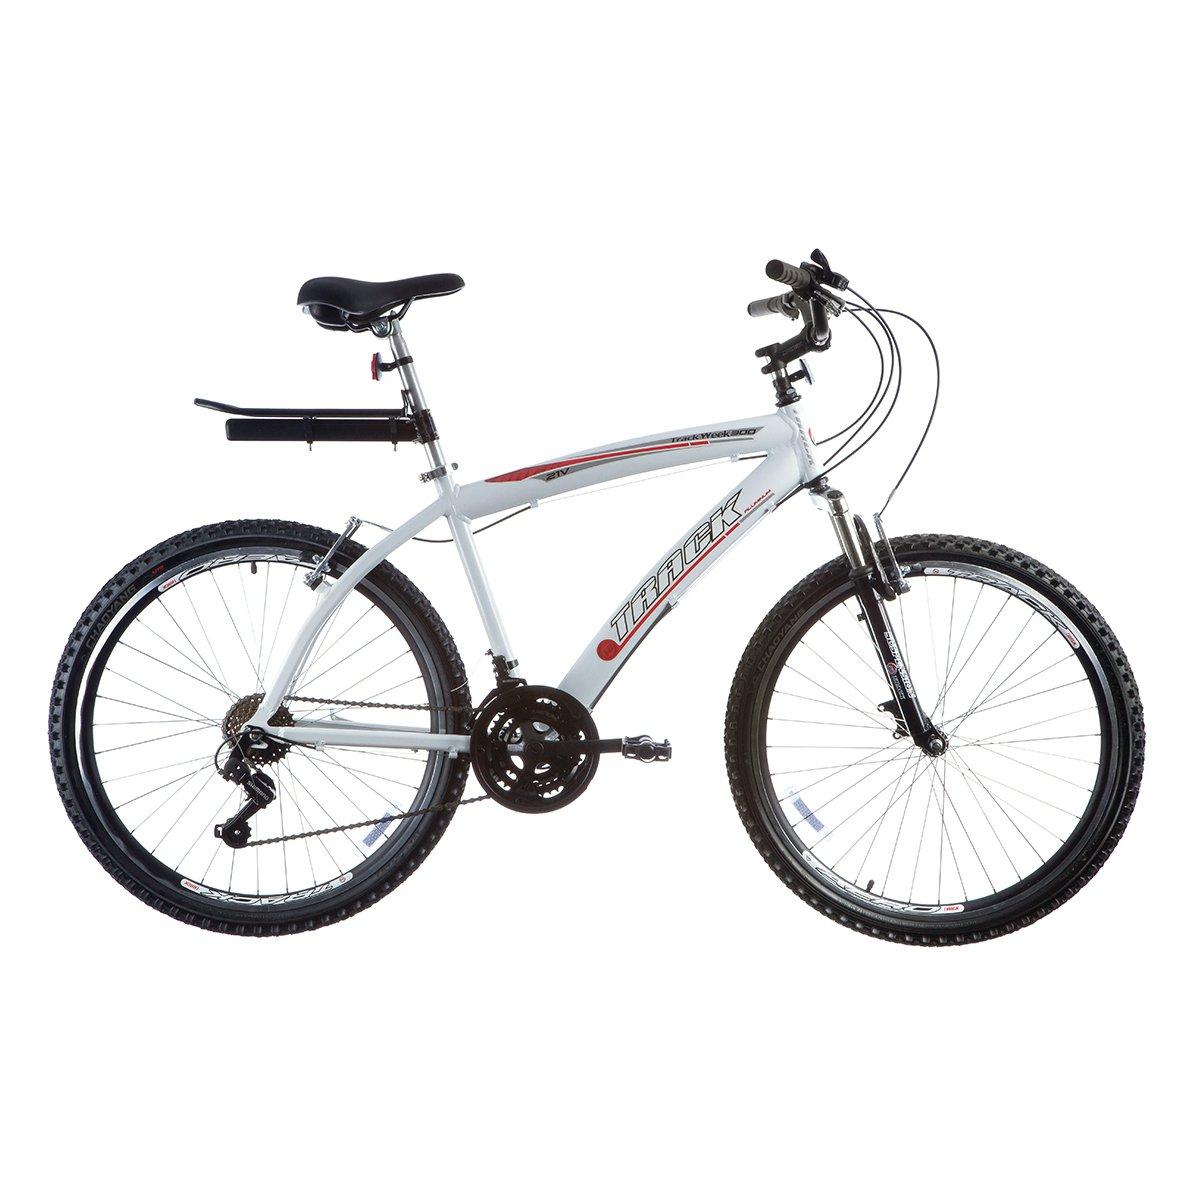 Bicicleta Track Bikes Week 300 Aro 26 - 21 Marcha - Branco